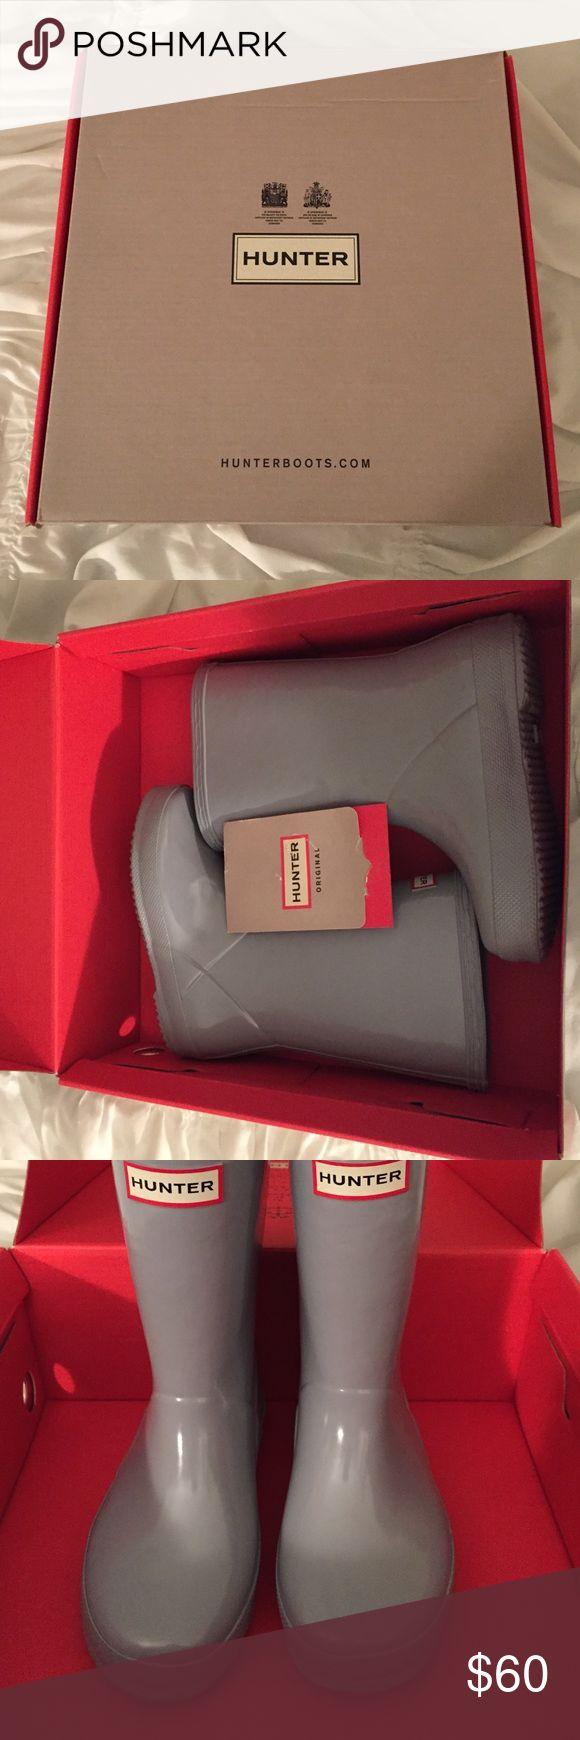 Kids HUNTER Boots US 11B Like New Girls Hunter boots. color Porcelain Blue Hunter Boots Shoes Rain & Snow Boots